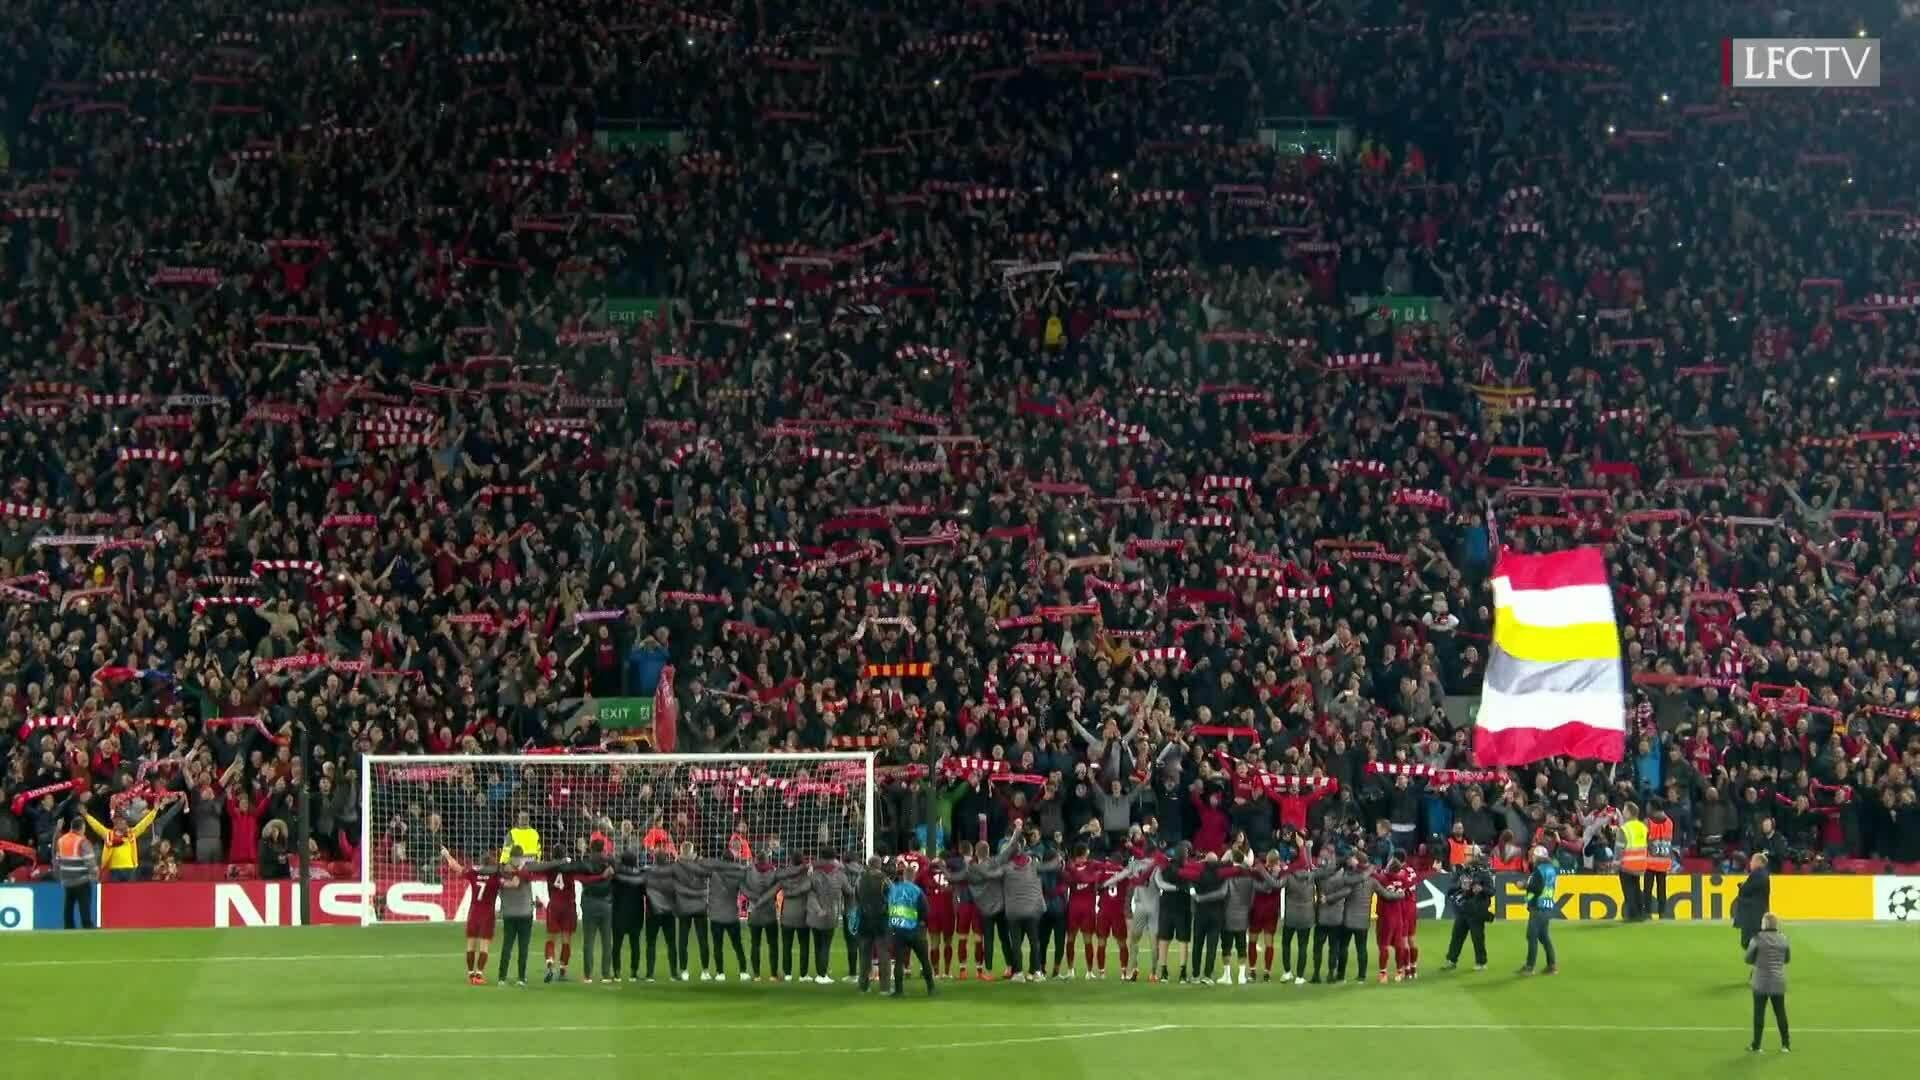 CĐV Liverpool hát You Never Never Alone